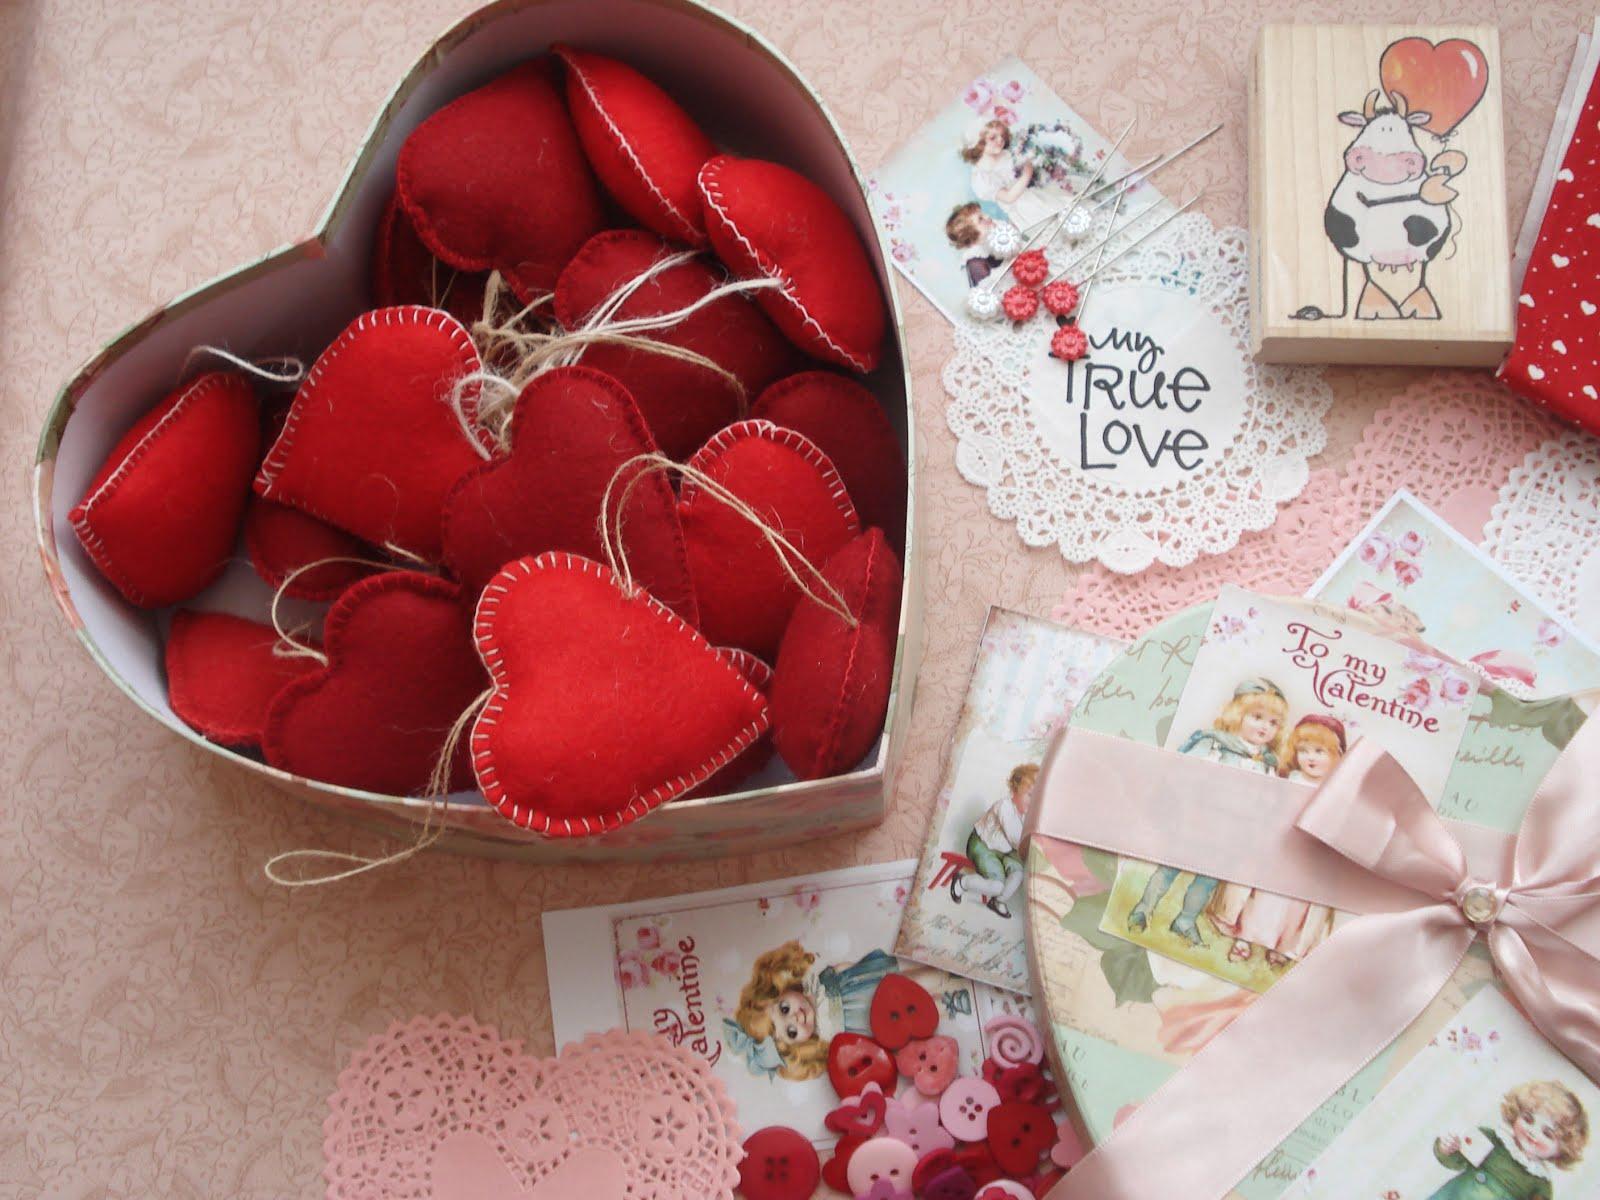 День святого валентина подарки